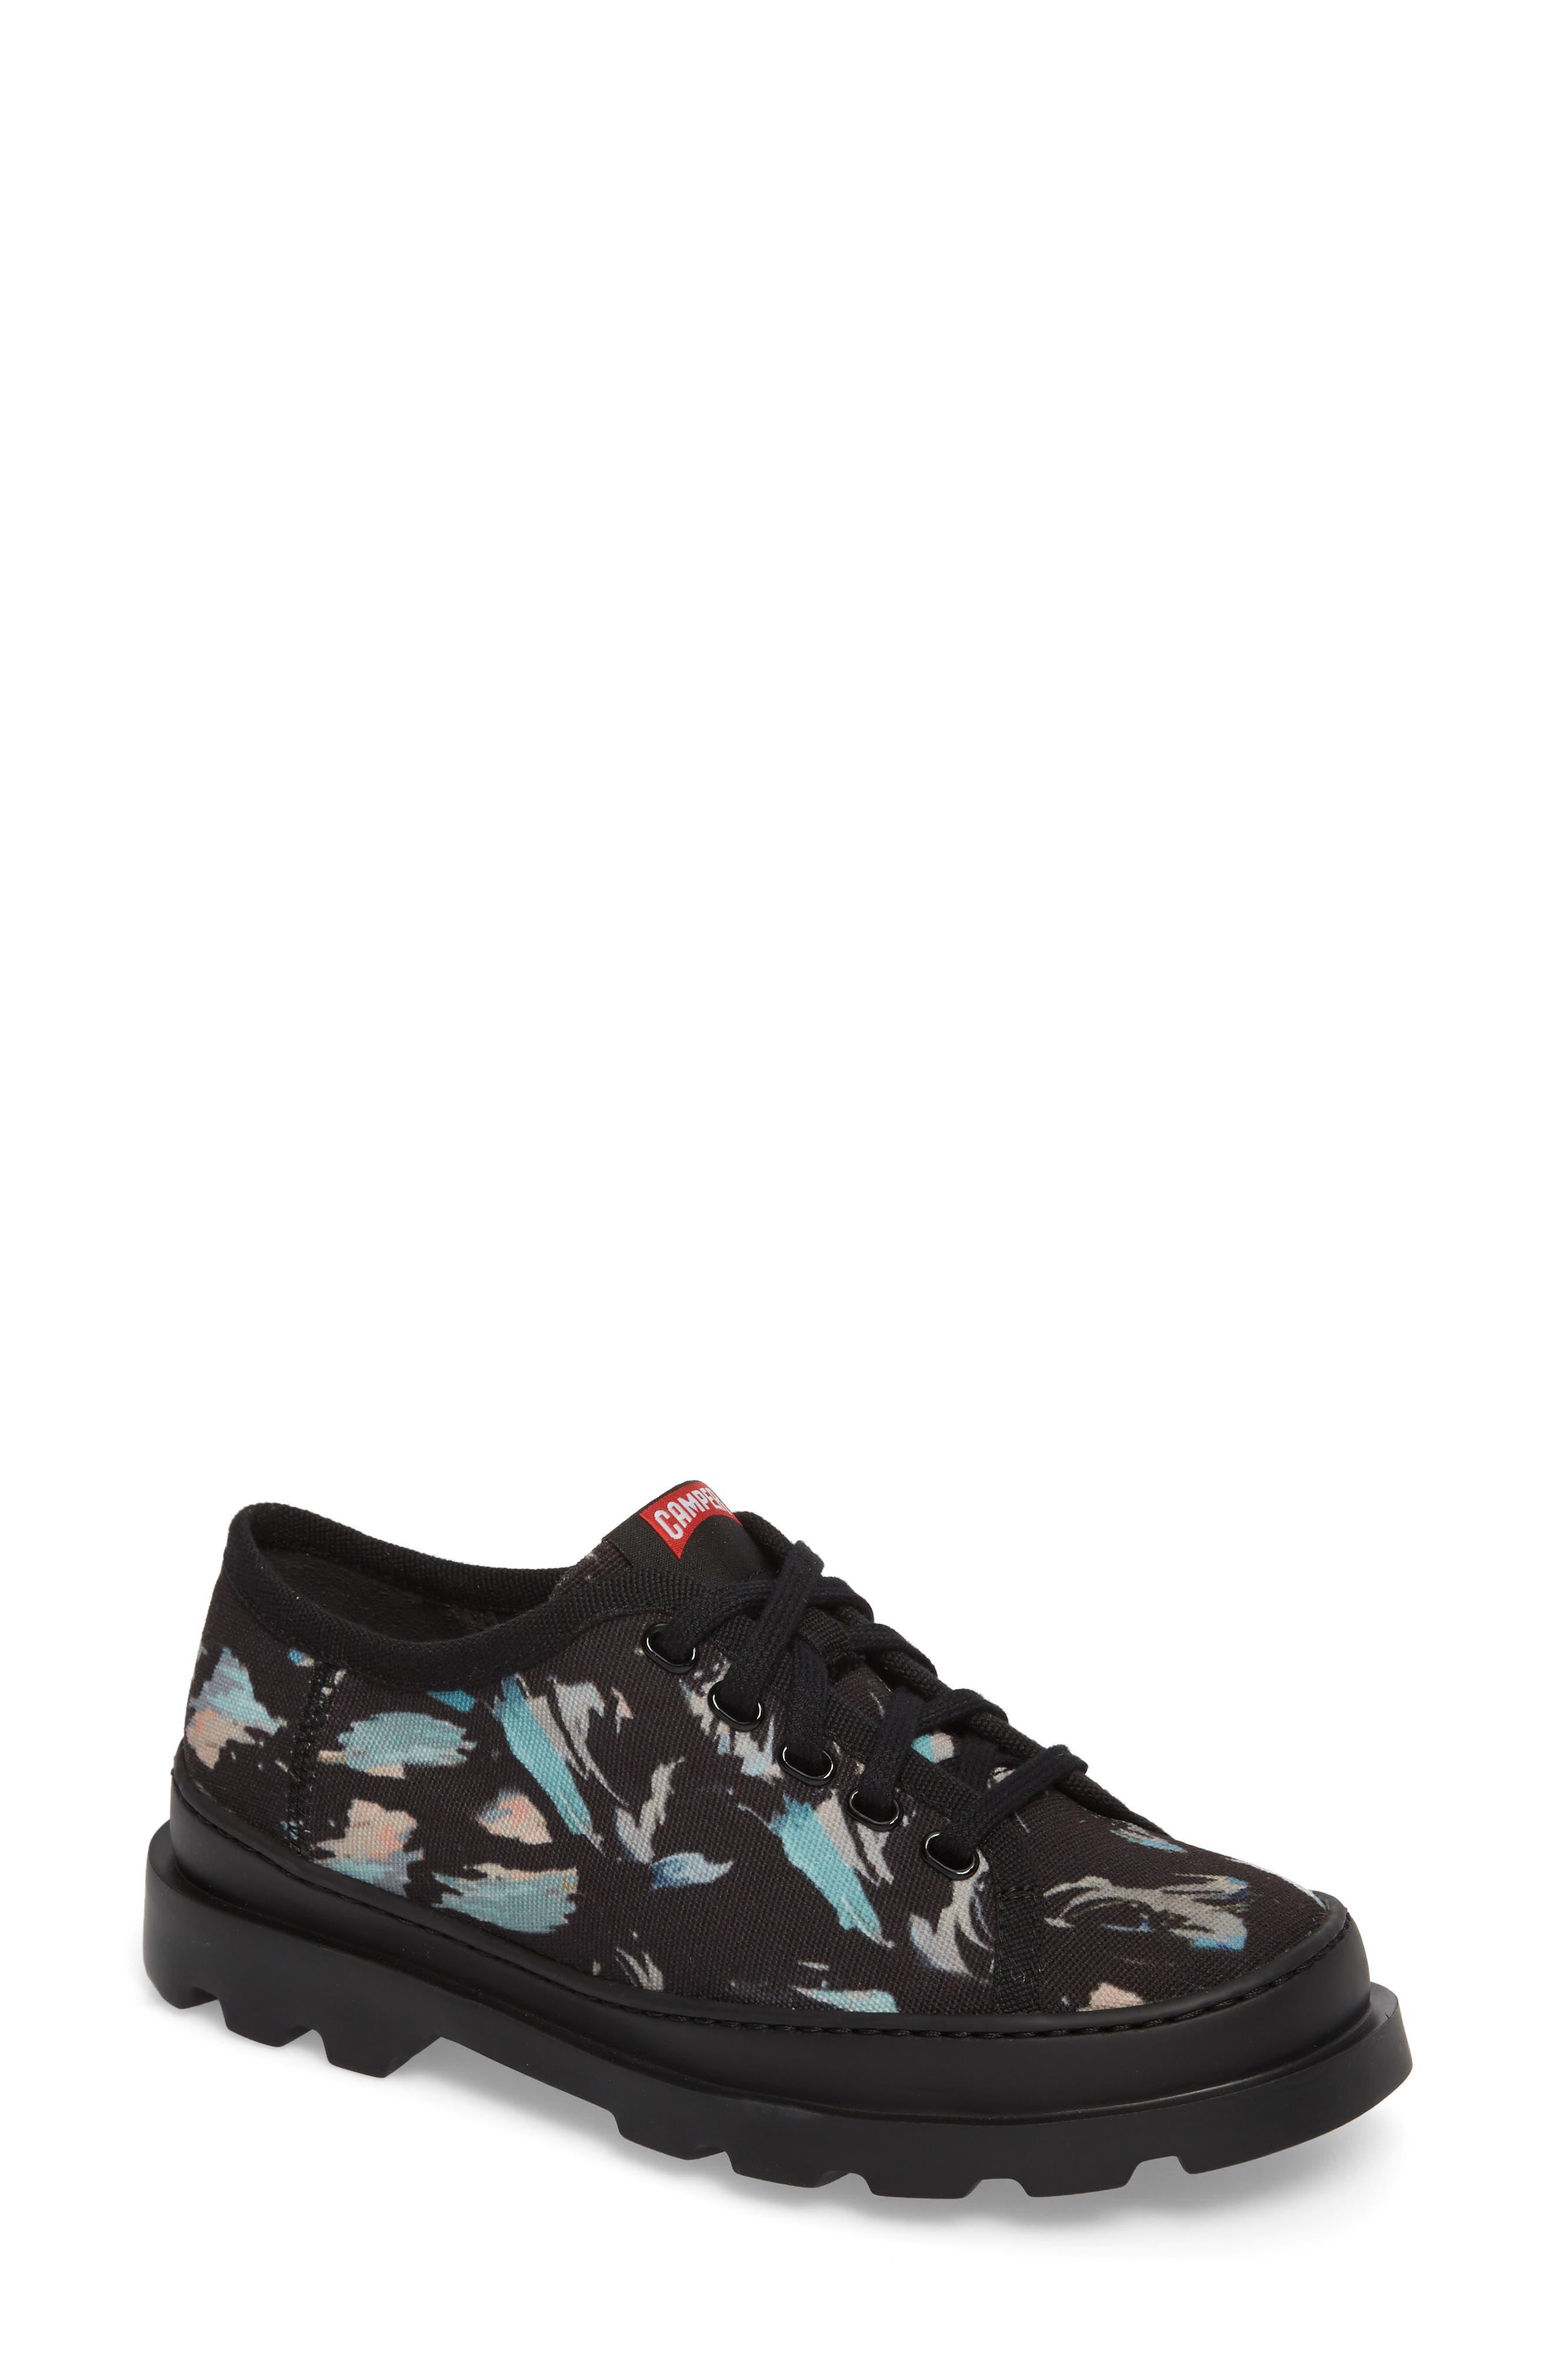 Brutus Lugged Platform Sneaker,                             Main thumbnail 1, color,                             Black Multi